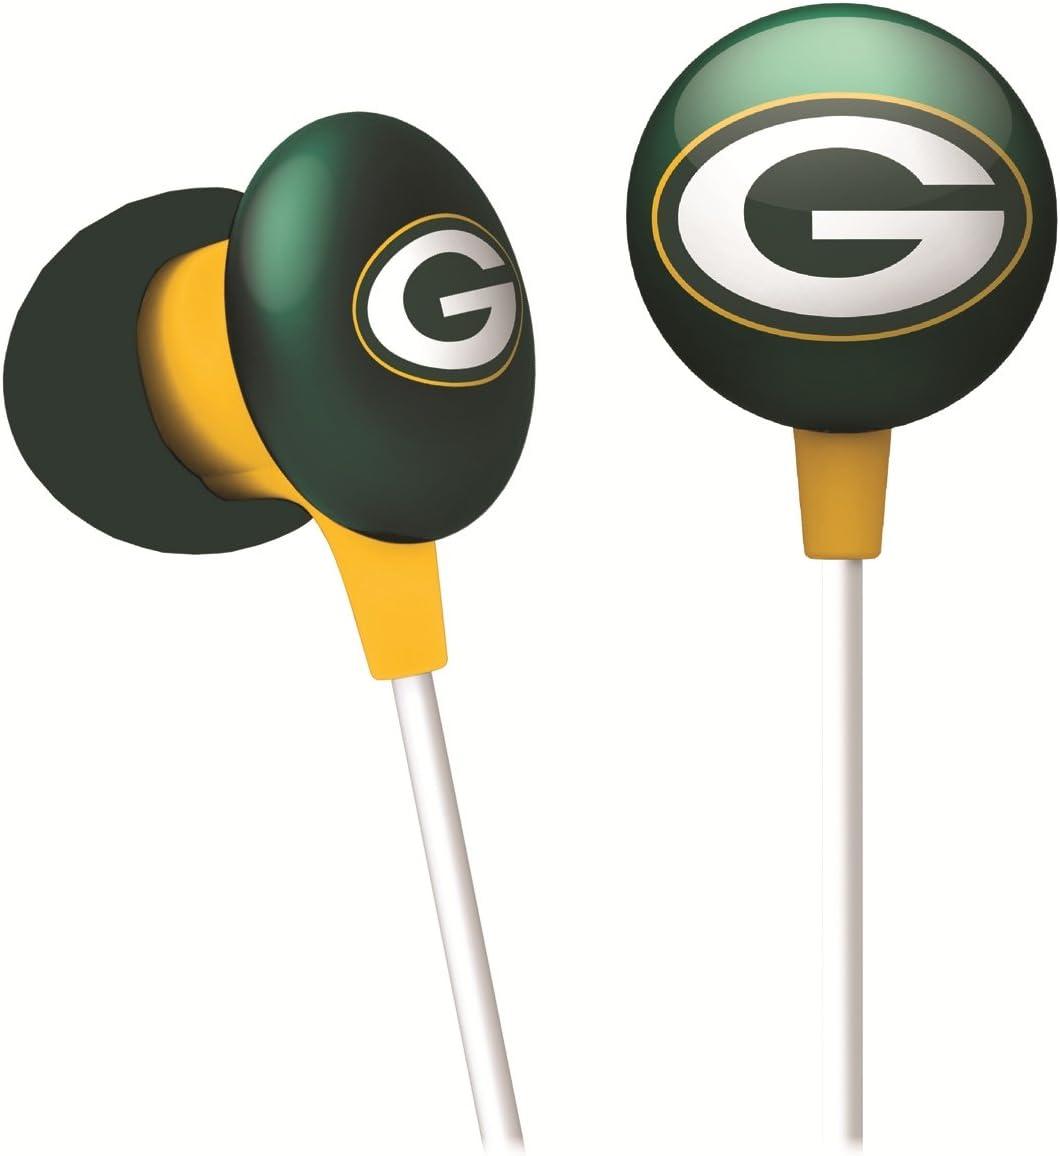 Greenbay Packers ears